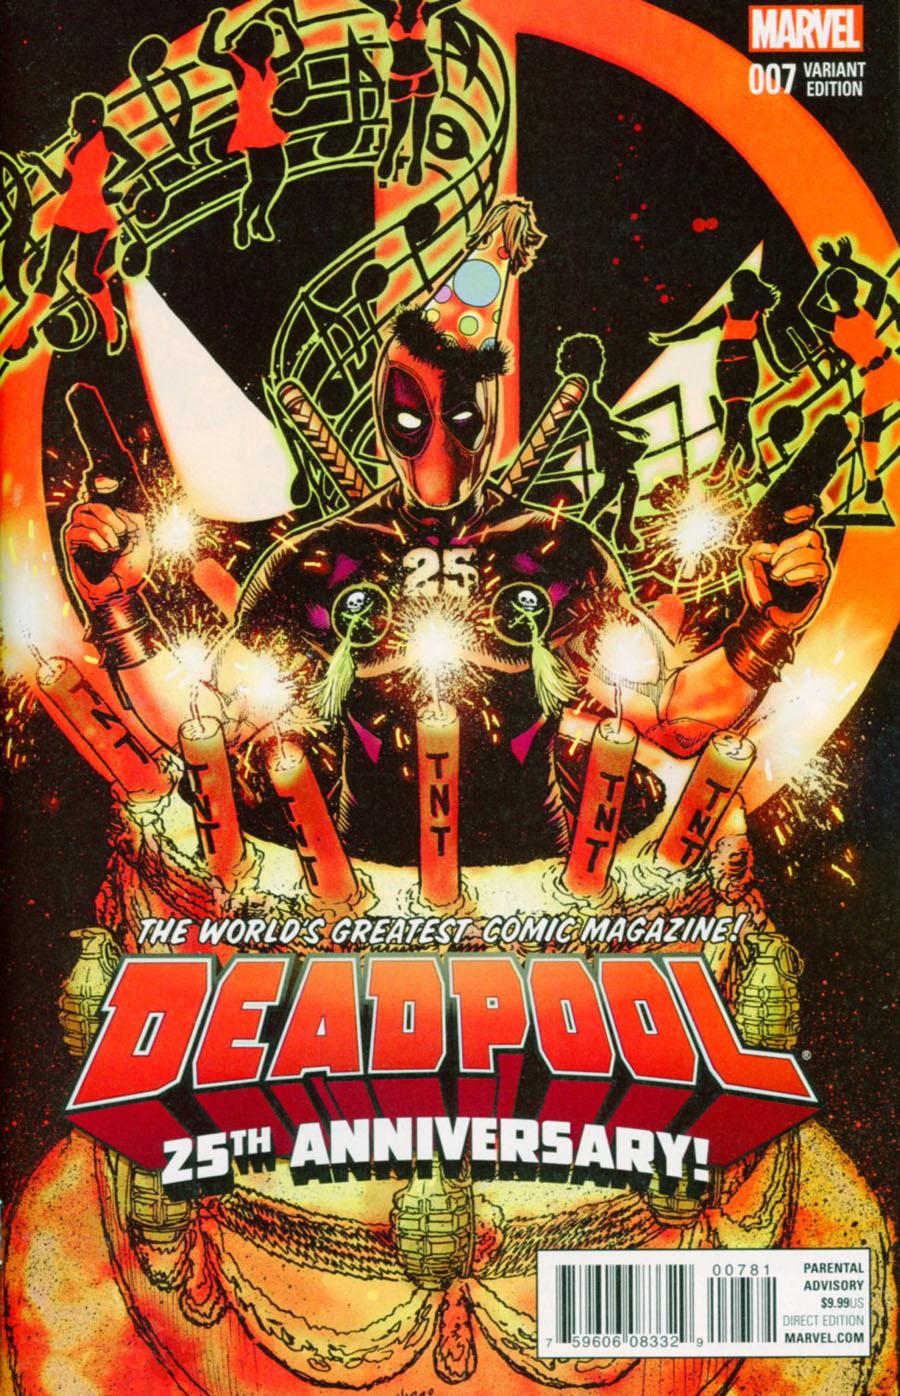 Deadpool Vol 5 #7 Cover F Variant Tony Harris Deadpool 25th Anniversary Cover